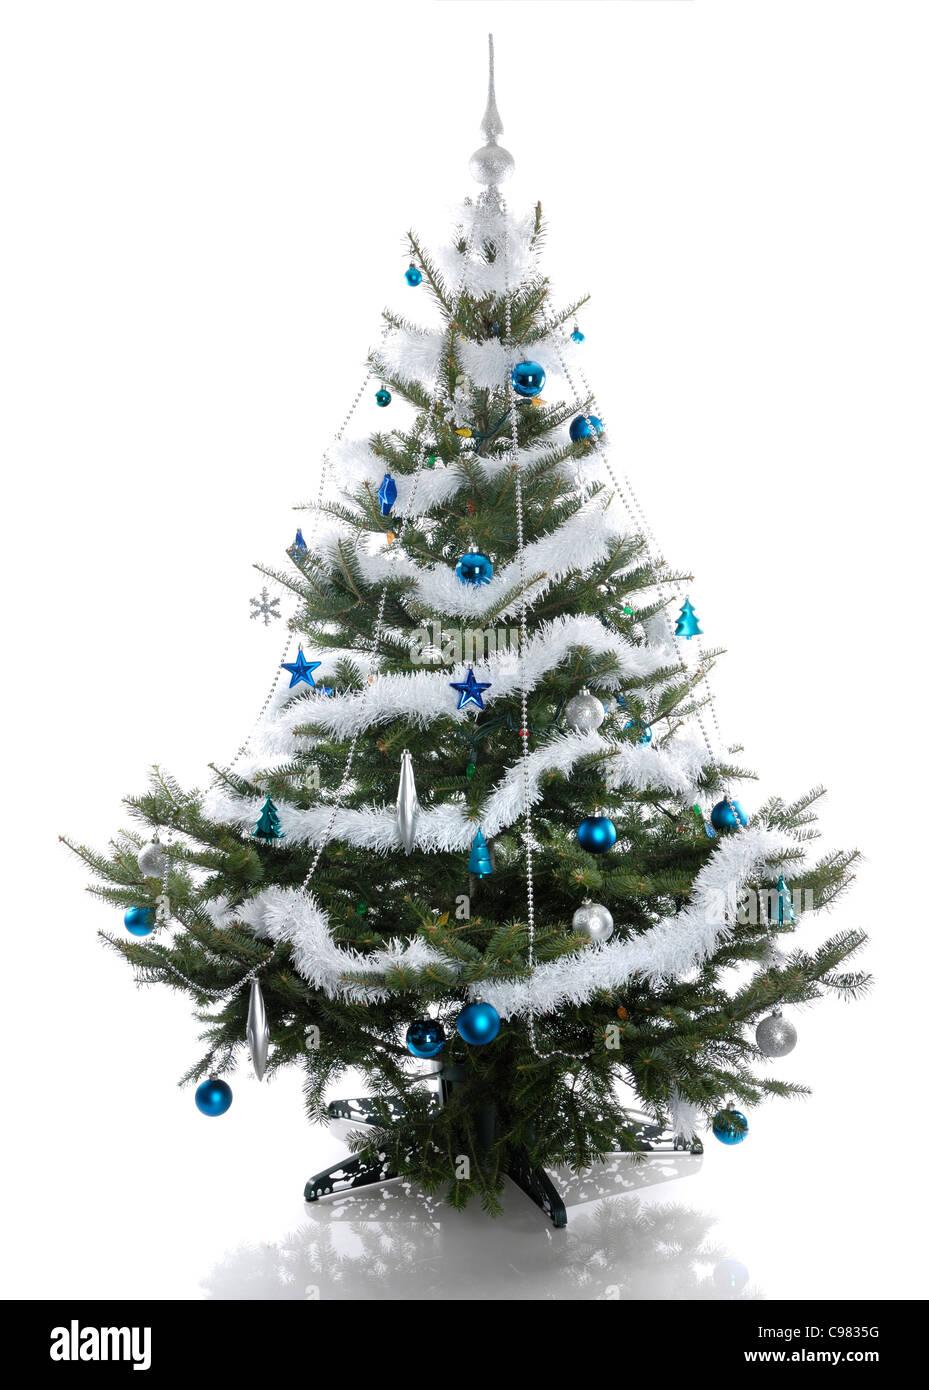 Decorated Christmas tree isolated on white background - Stock Image